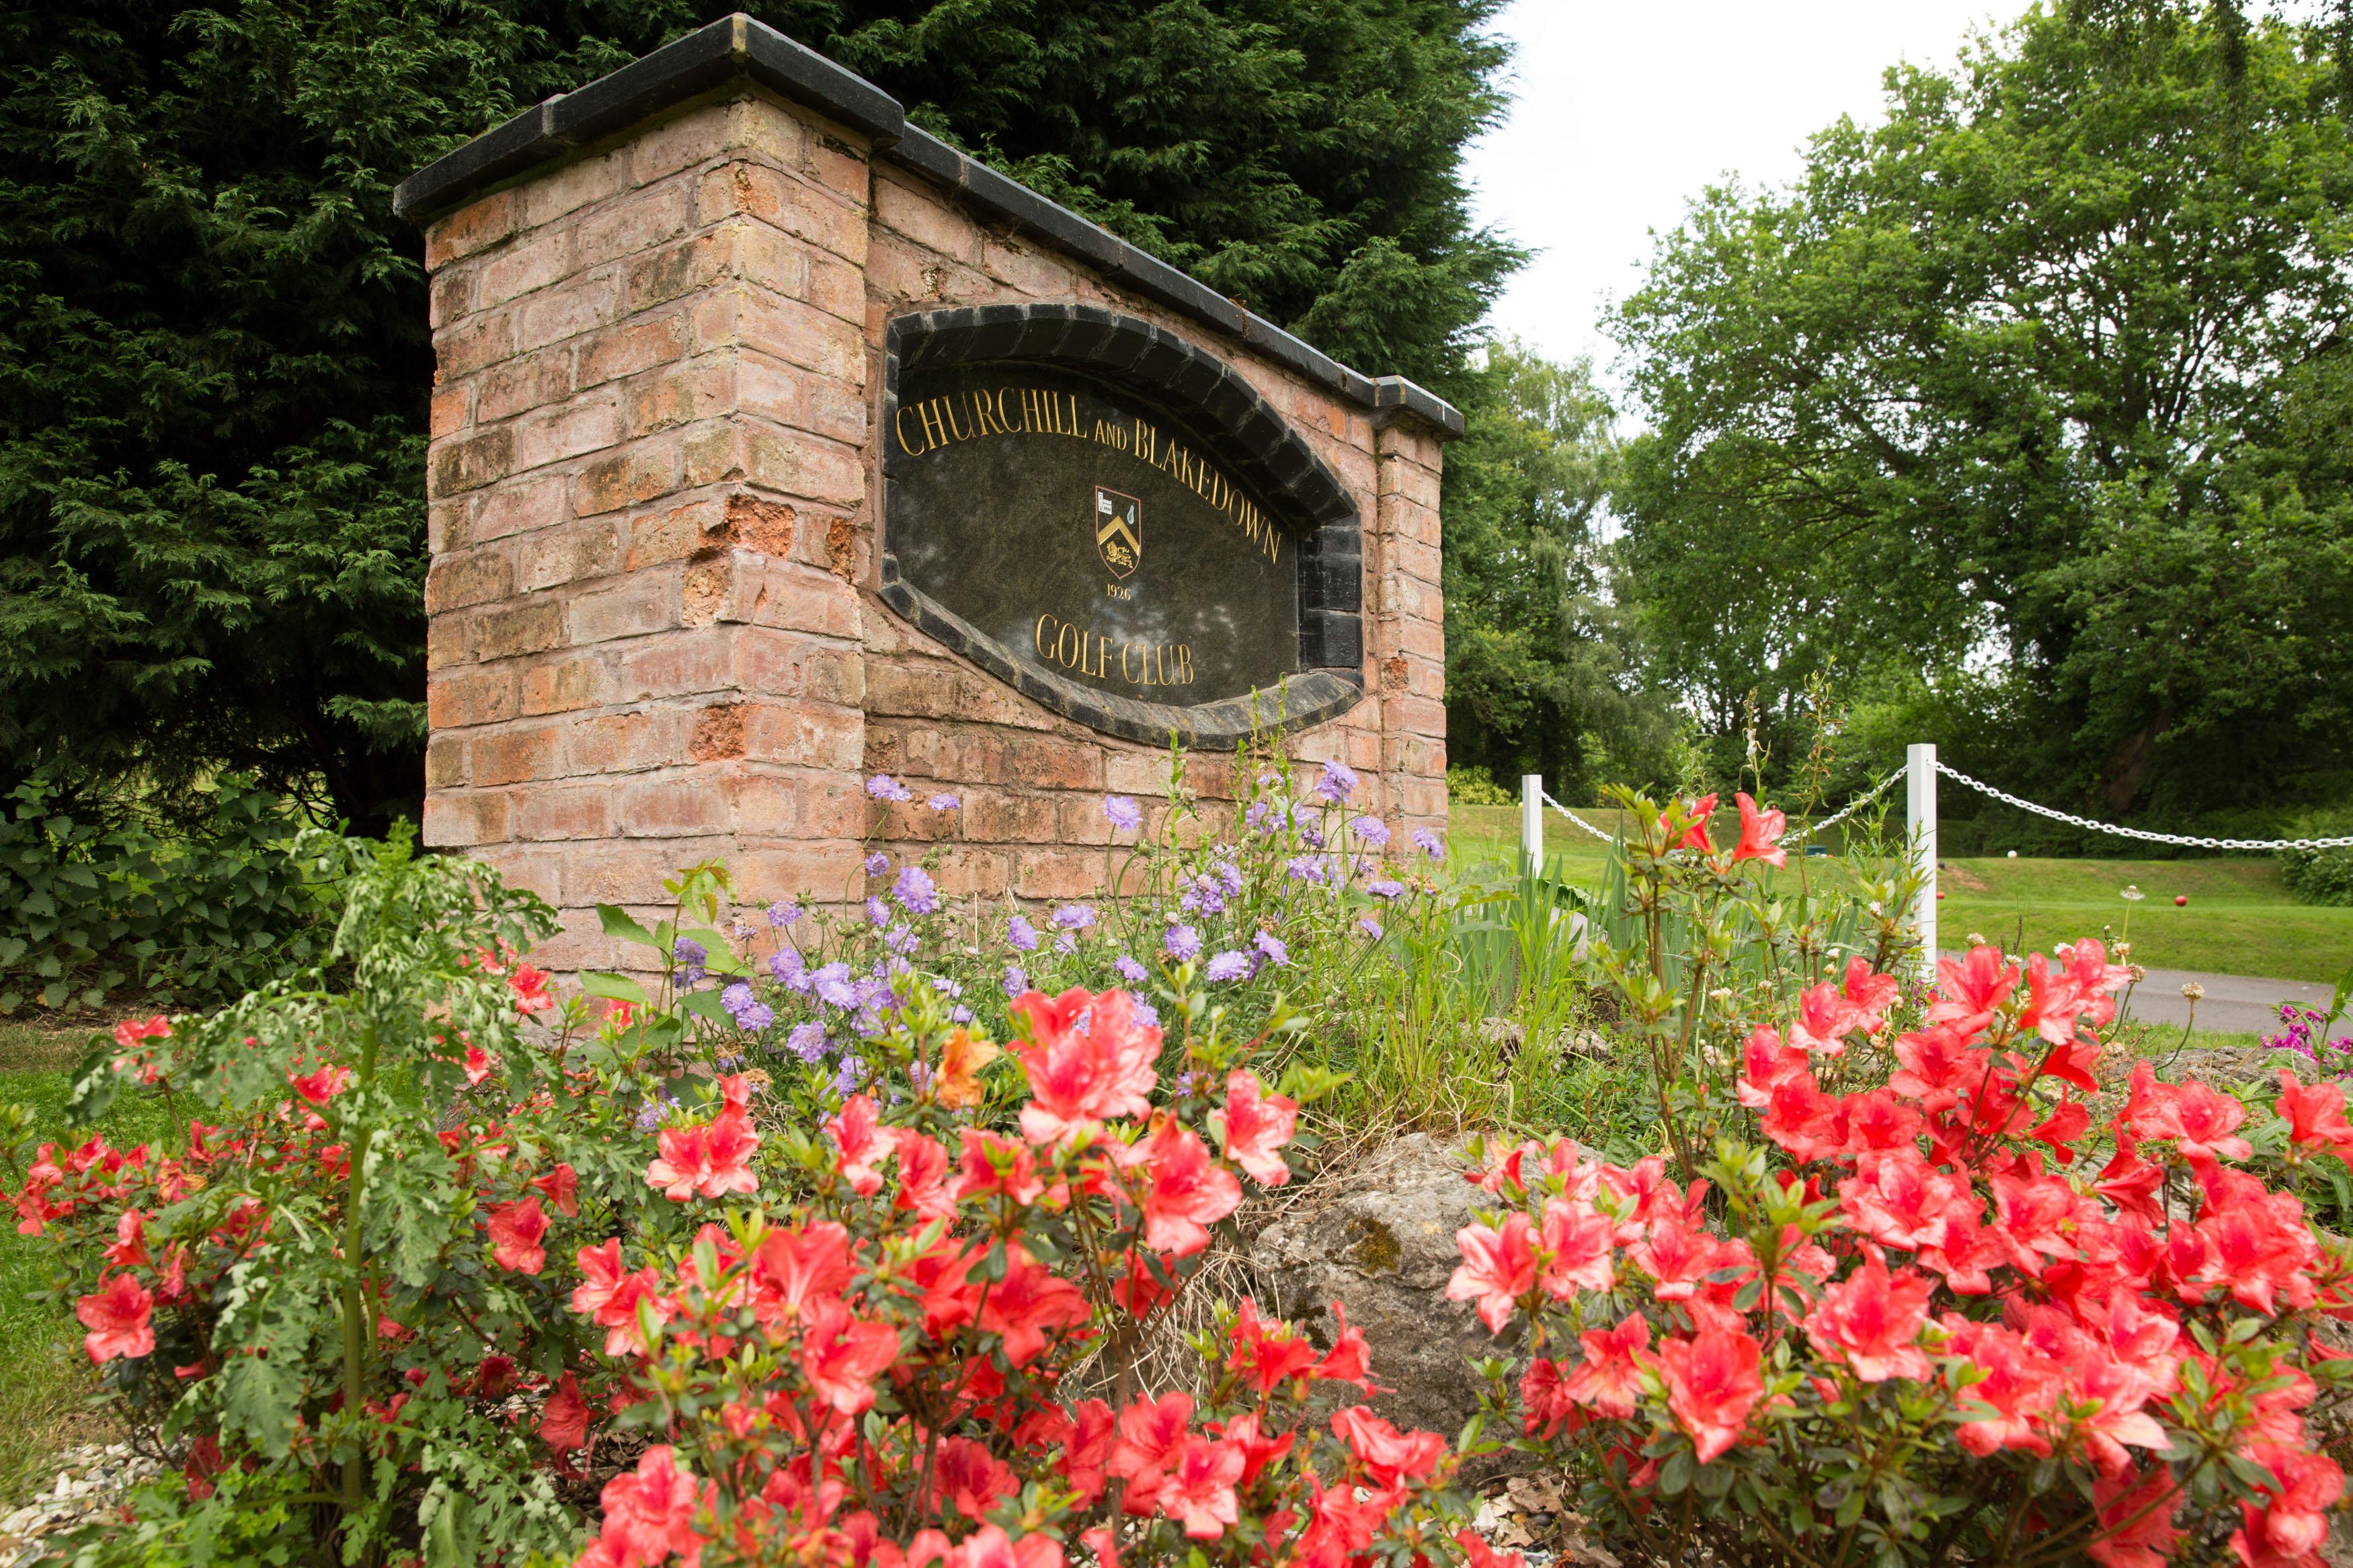 Churchill and Blakedown Golf Club